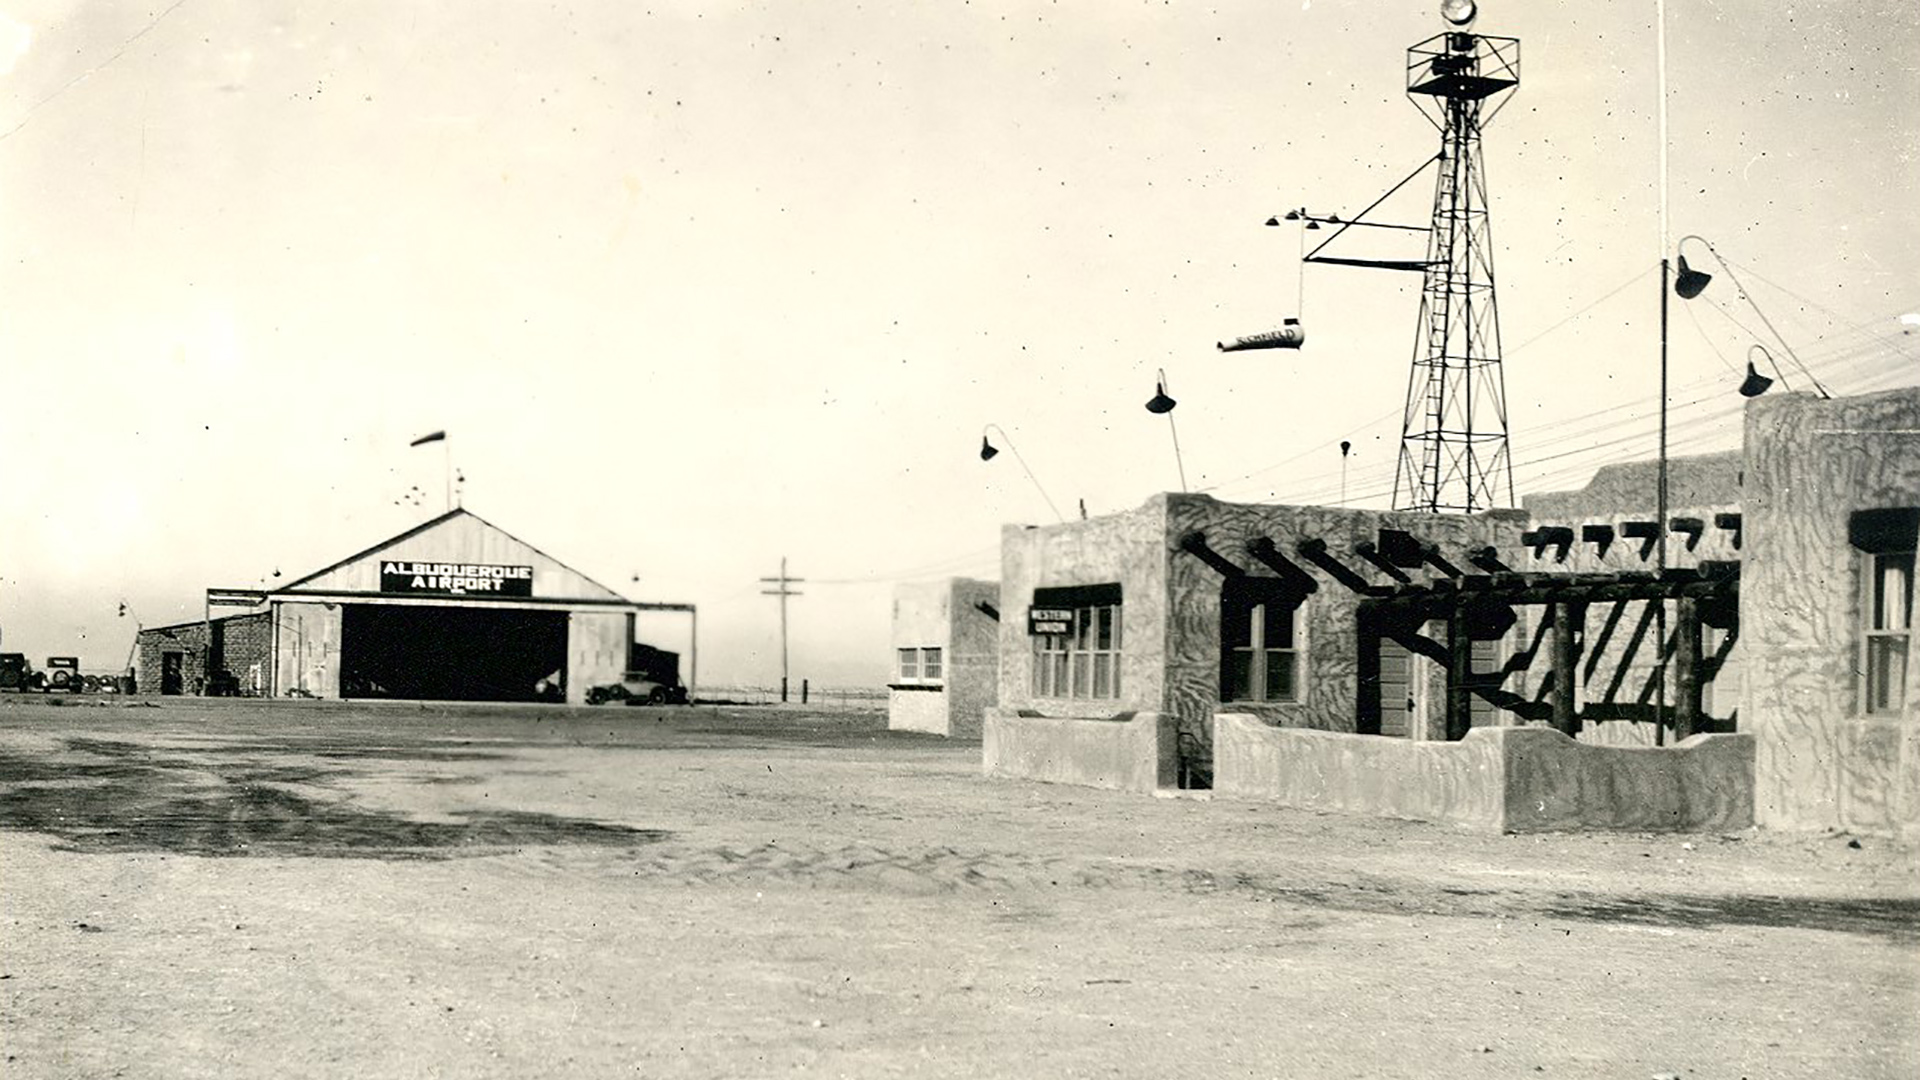 ABQ Sunport - History - 1930s